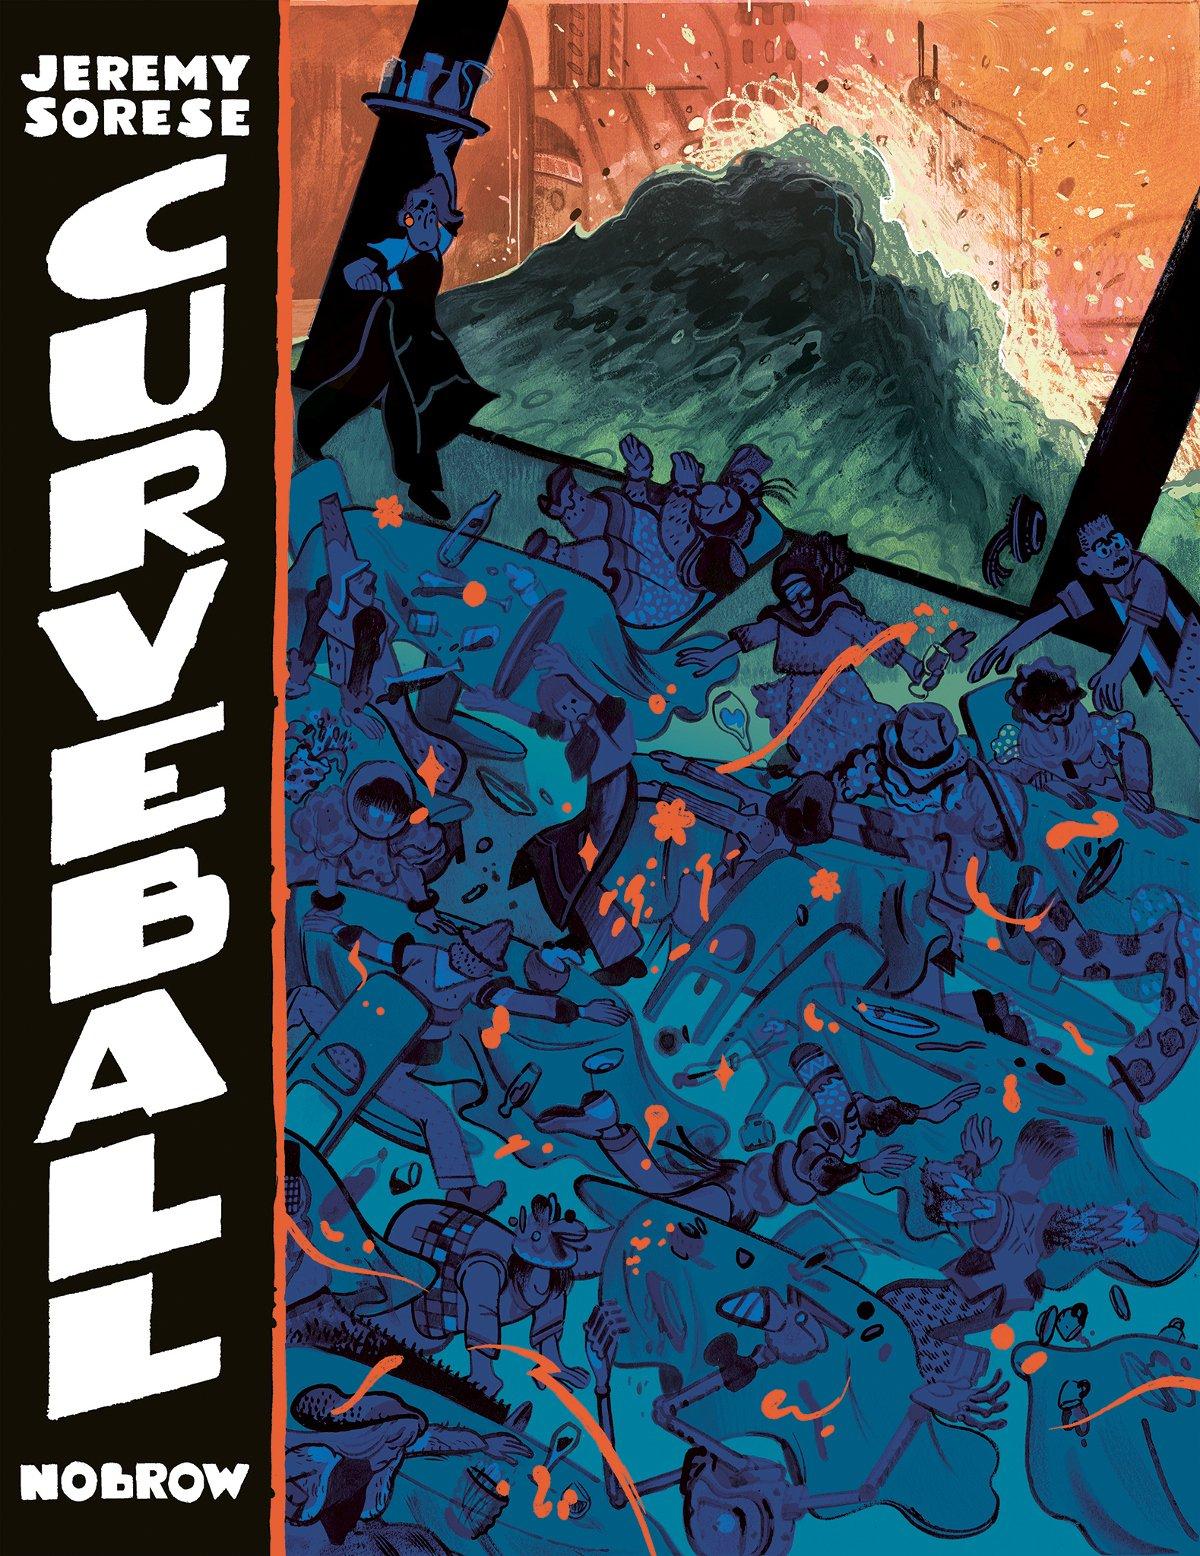 CURVEBALL by Jeremy Sorese Nobrow Press, November 2015